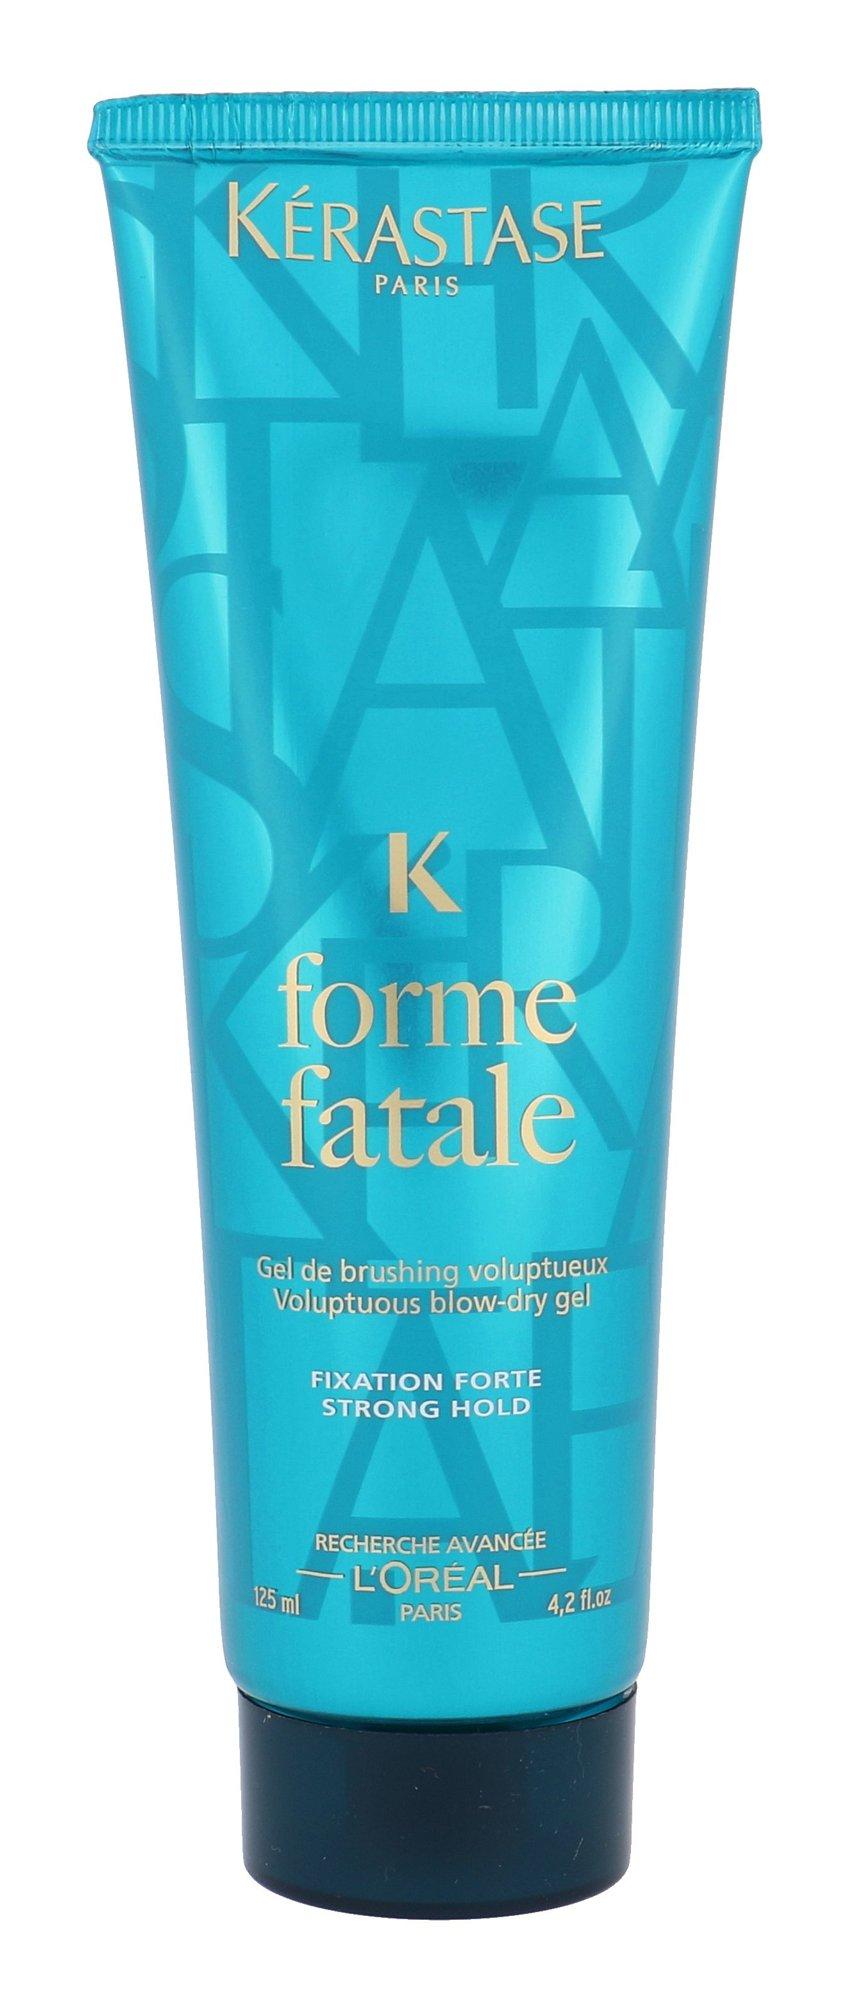 Kérastase Forme Fatale Cosmetic 125ml